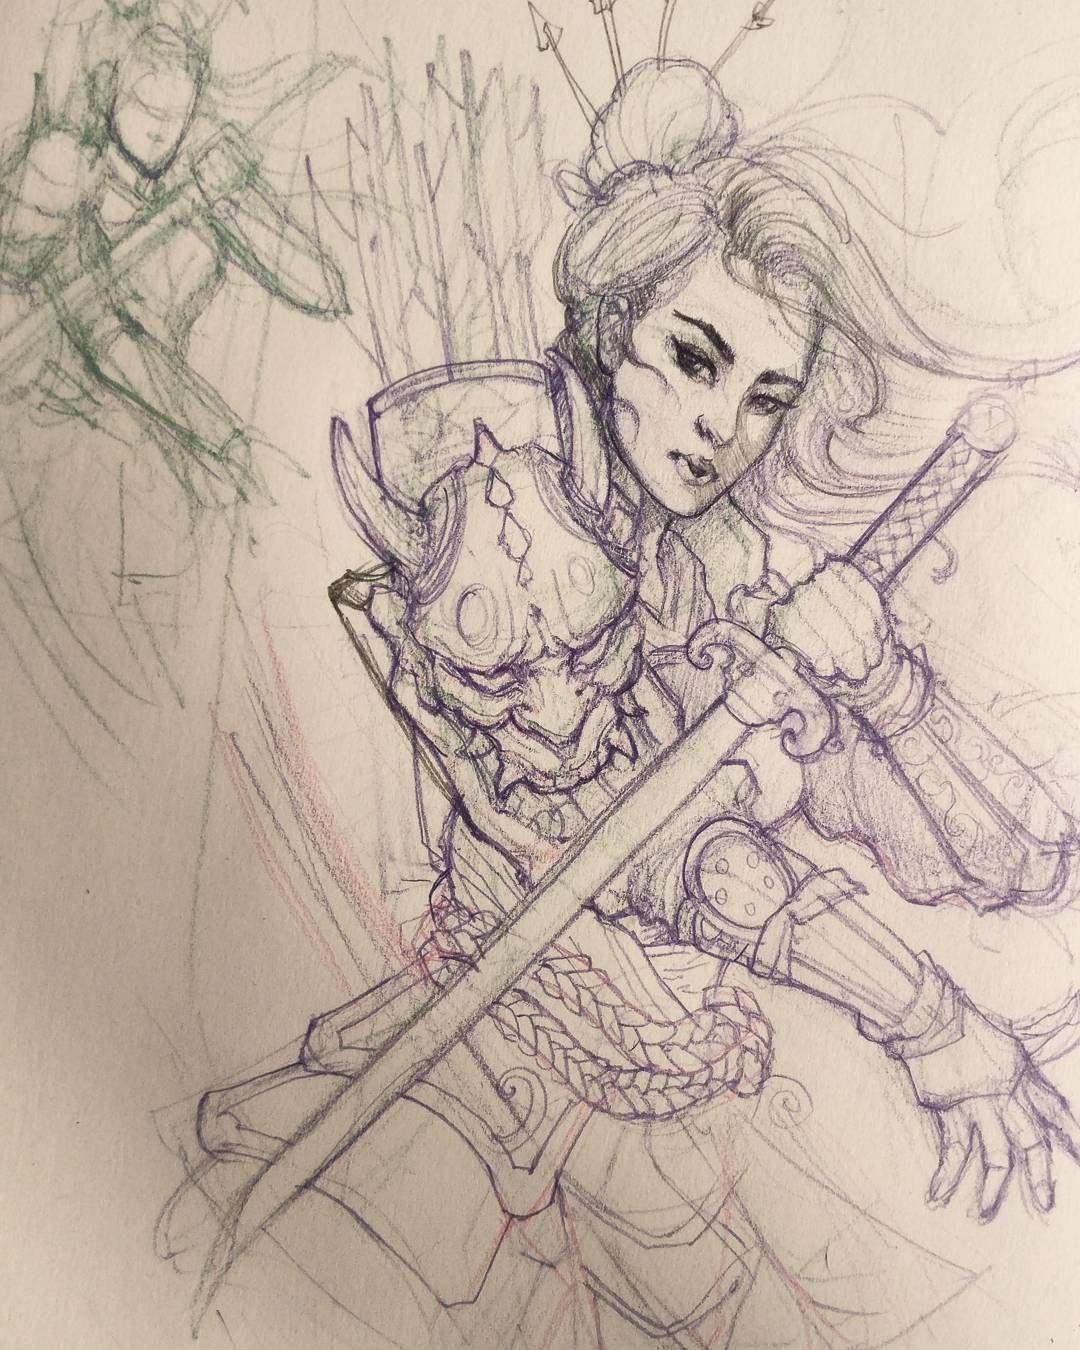 1080x1350 Geisha Warrior Sketch In Progress.